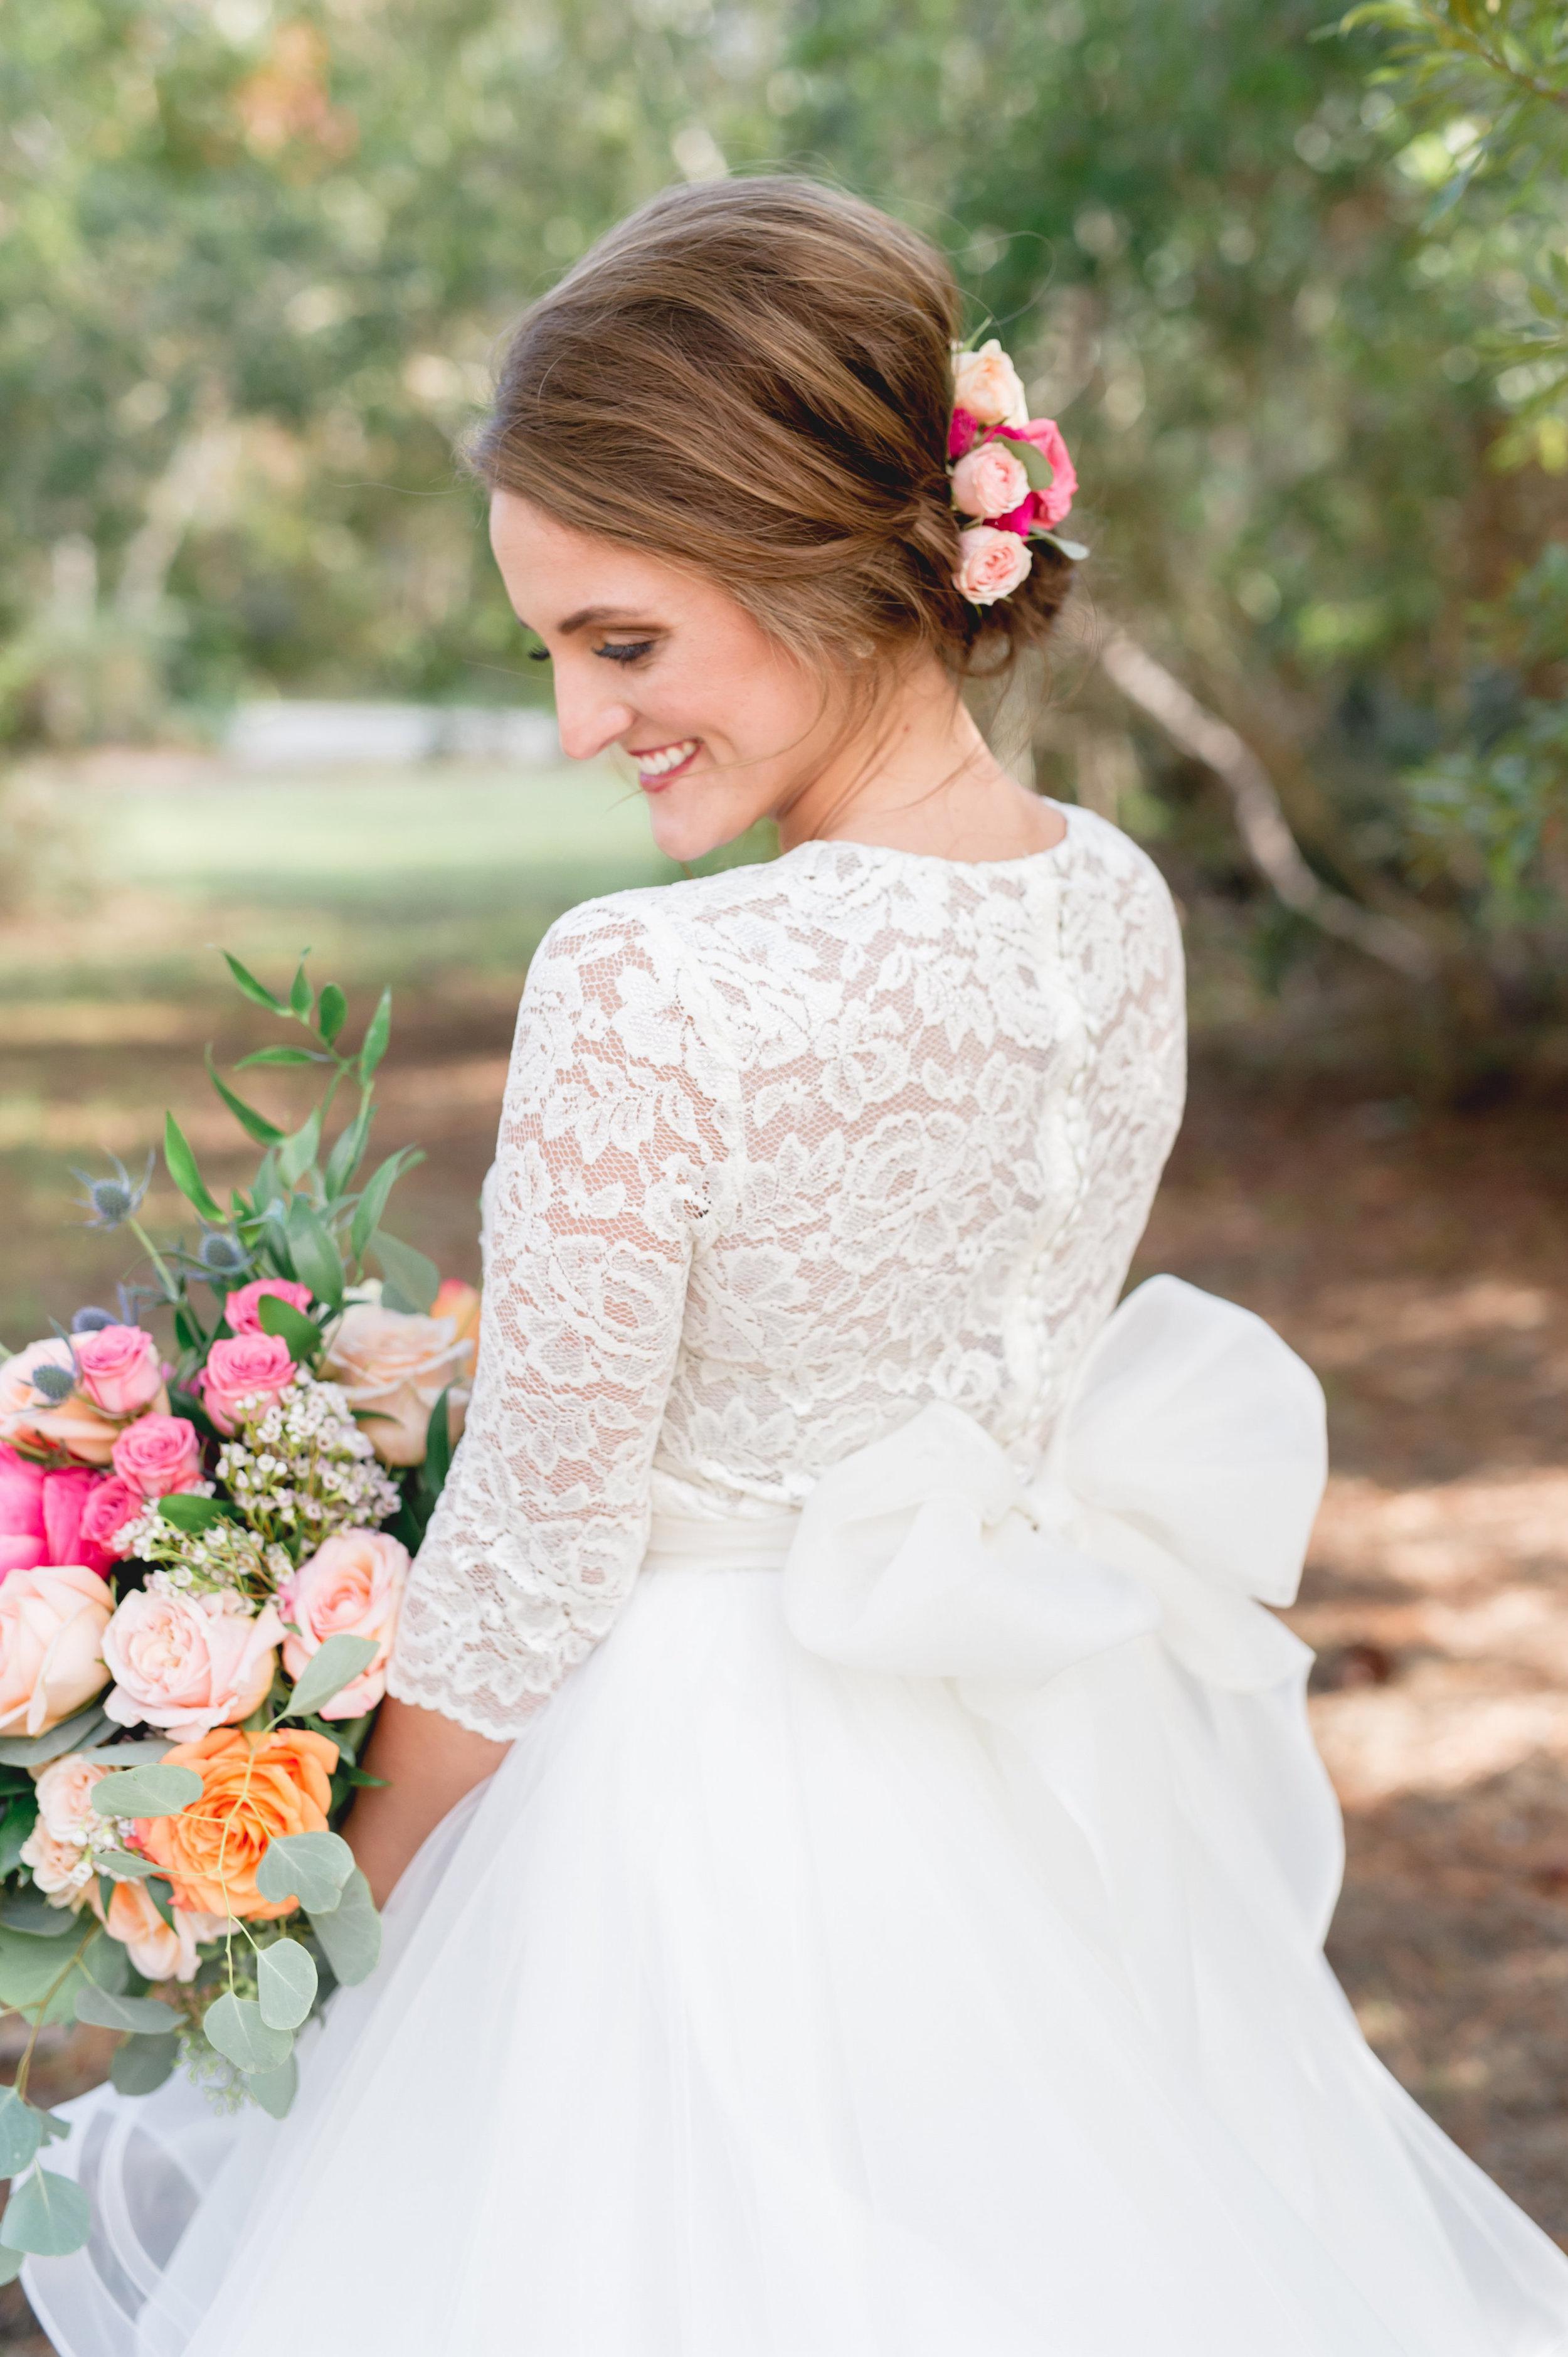 Joe Kendall Romantic Boho Wedding Gulf Shores AL-Bride and Groom-0032.jpg